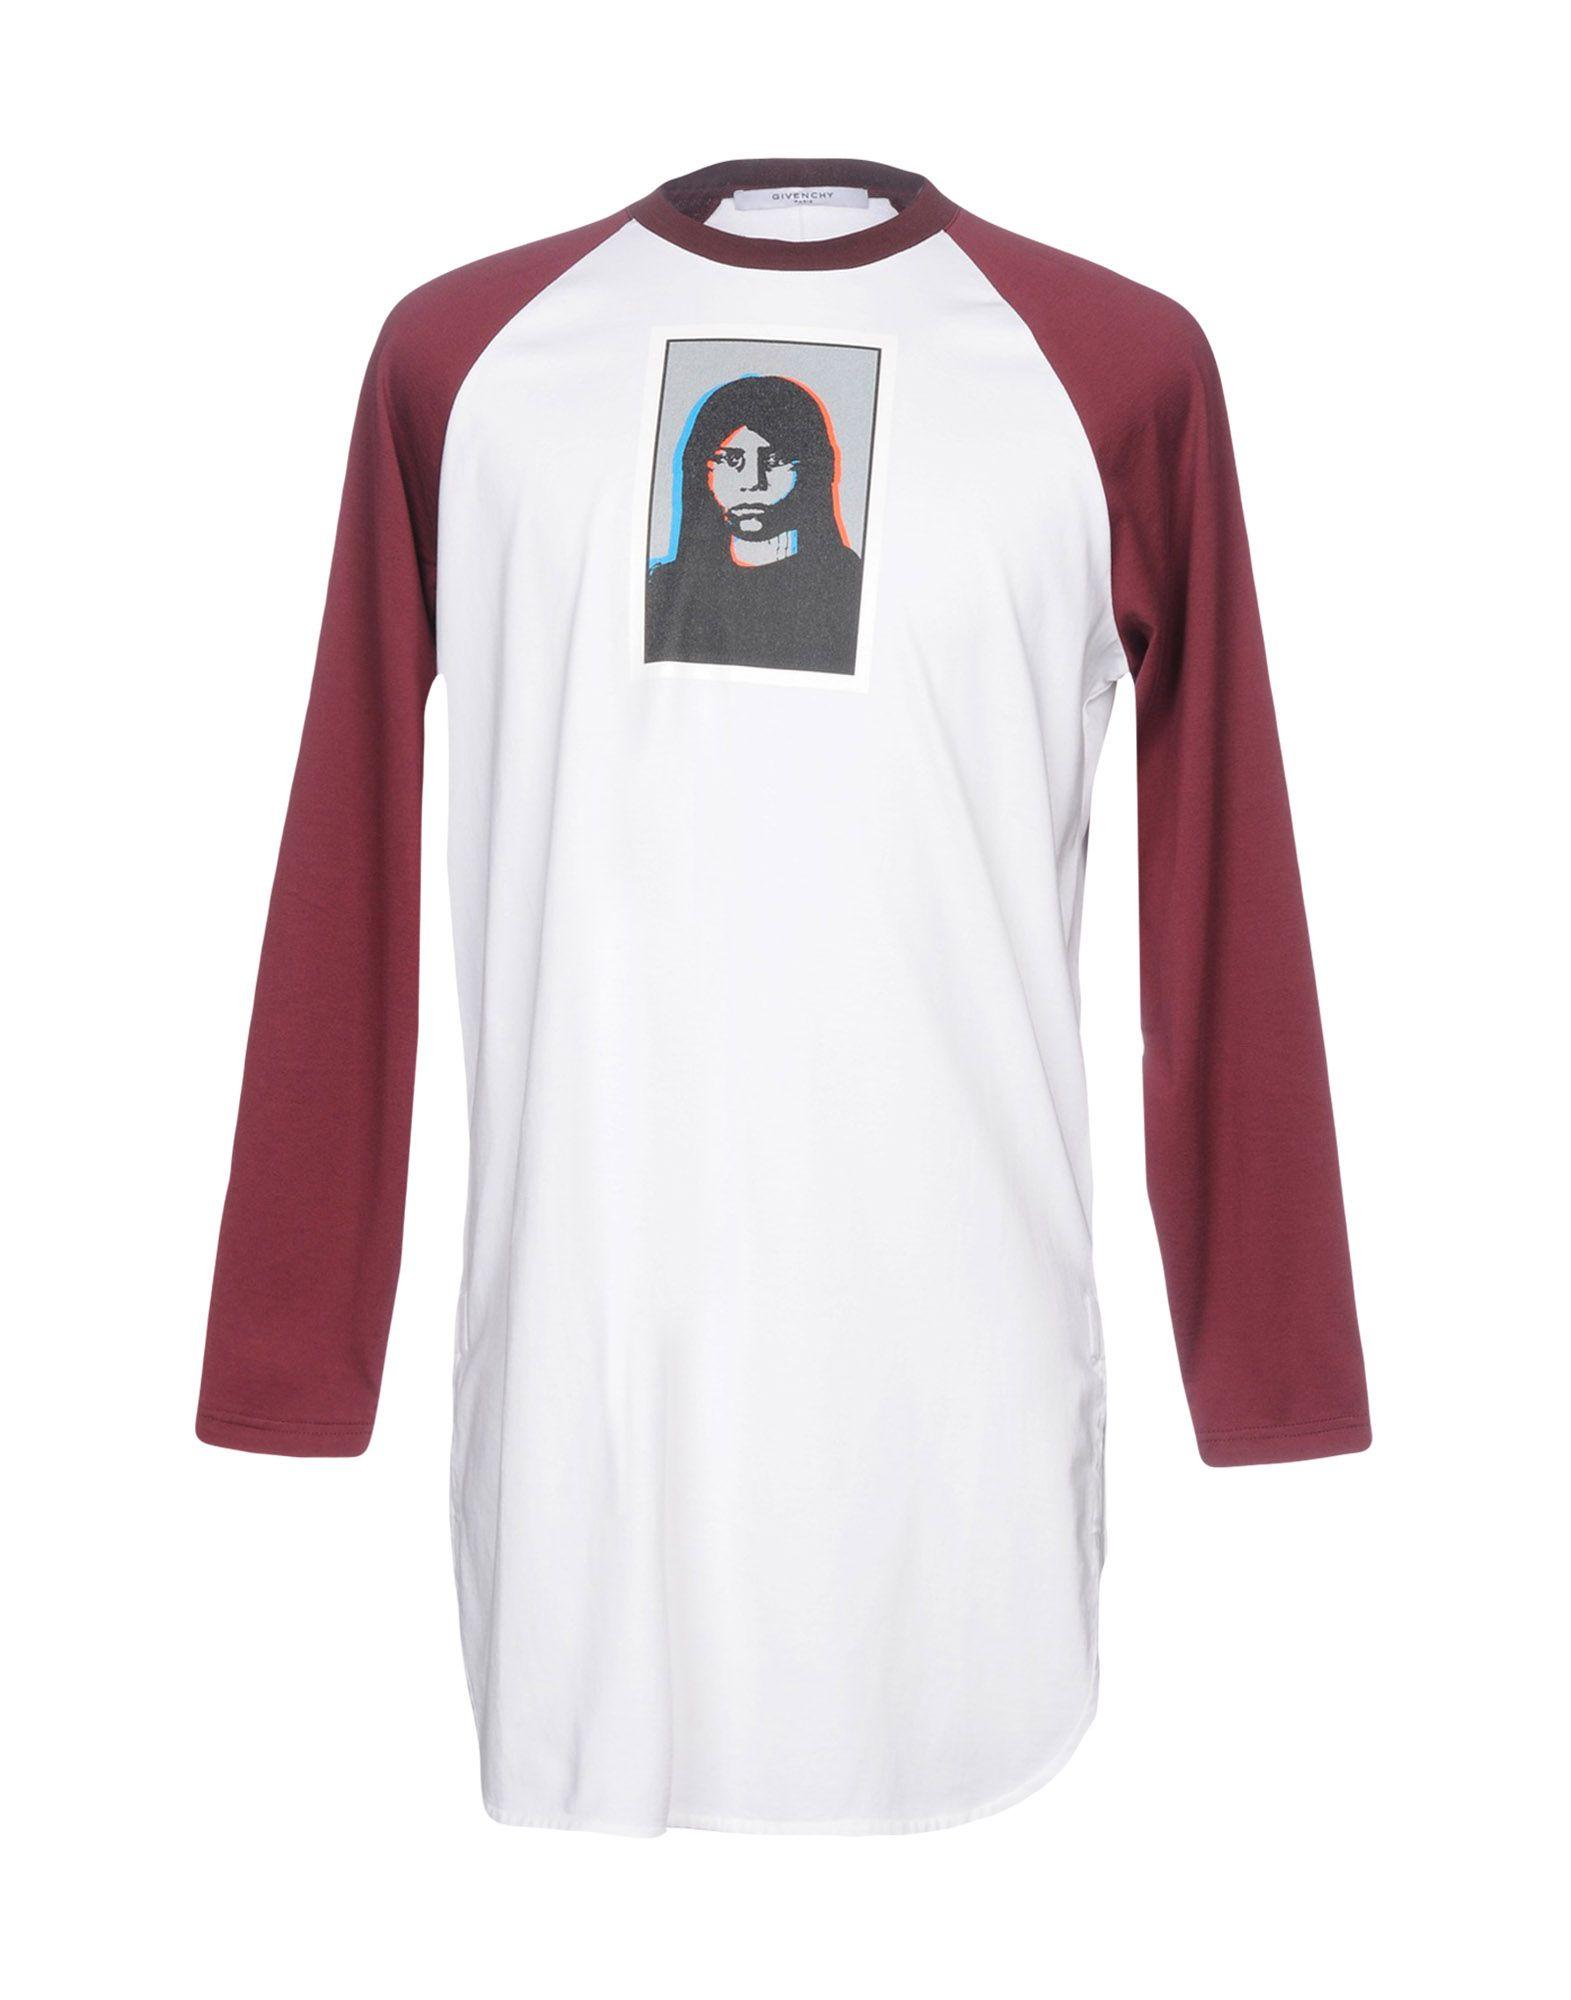 GIVENCHY Футболка футболка givenchy цвет серый